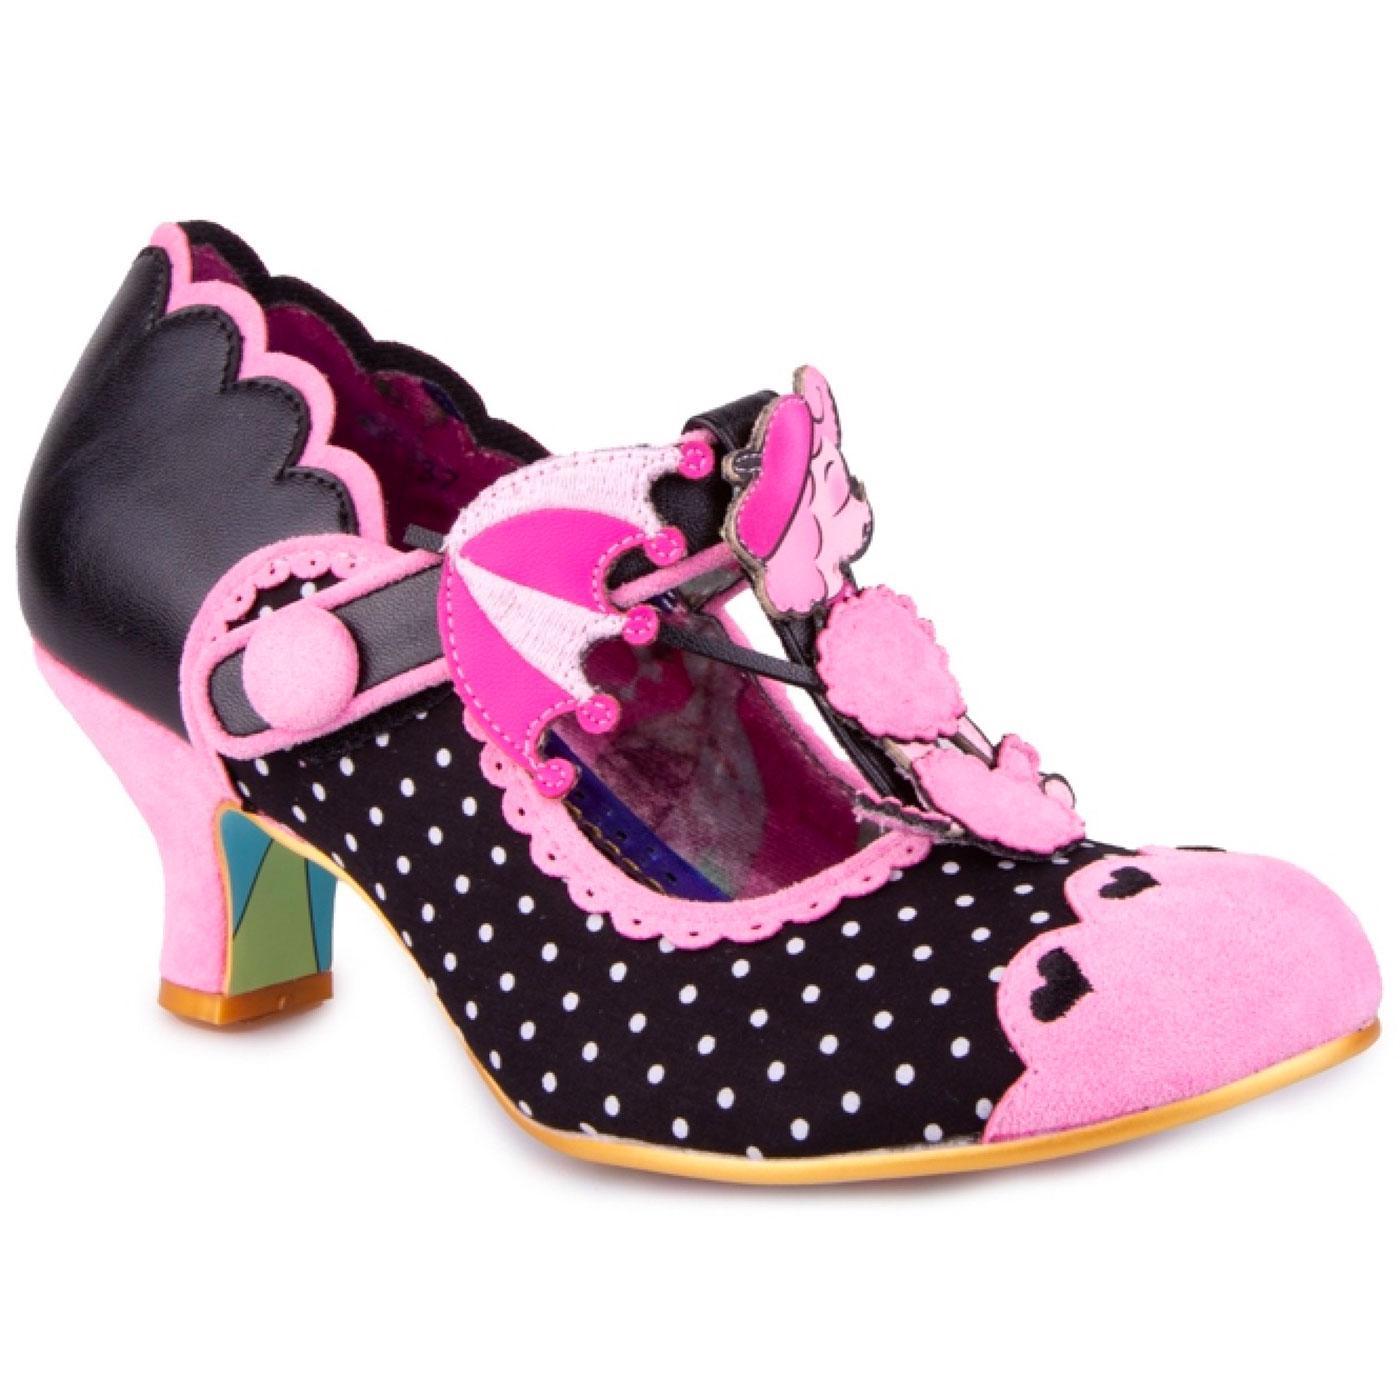 Poodle Perfect IRREGULAR CHOICE Retro T-Bar Shoes